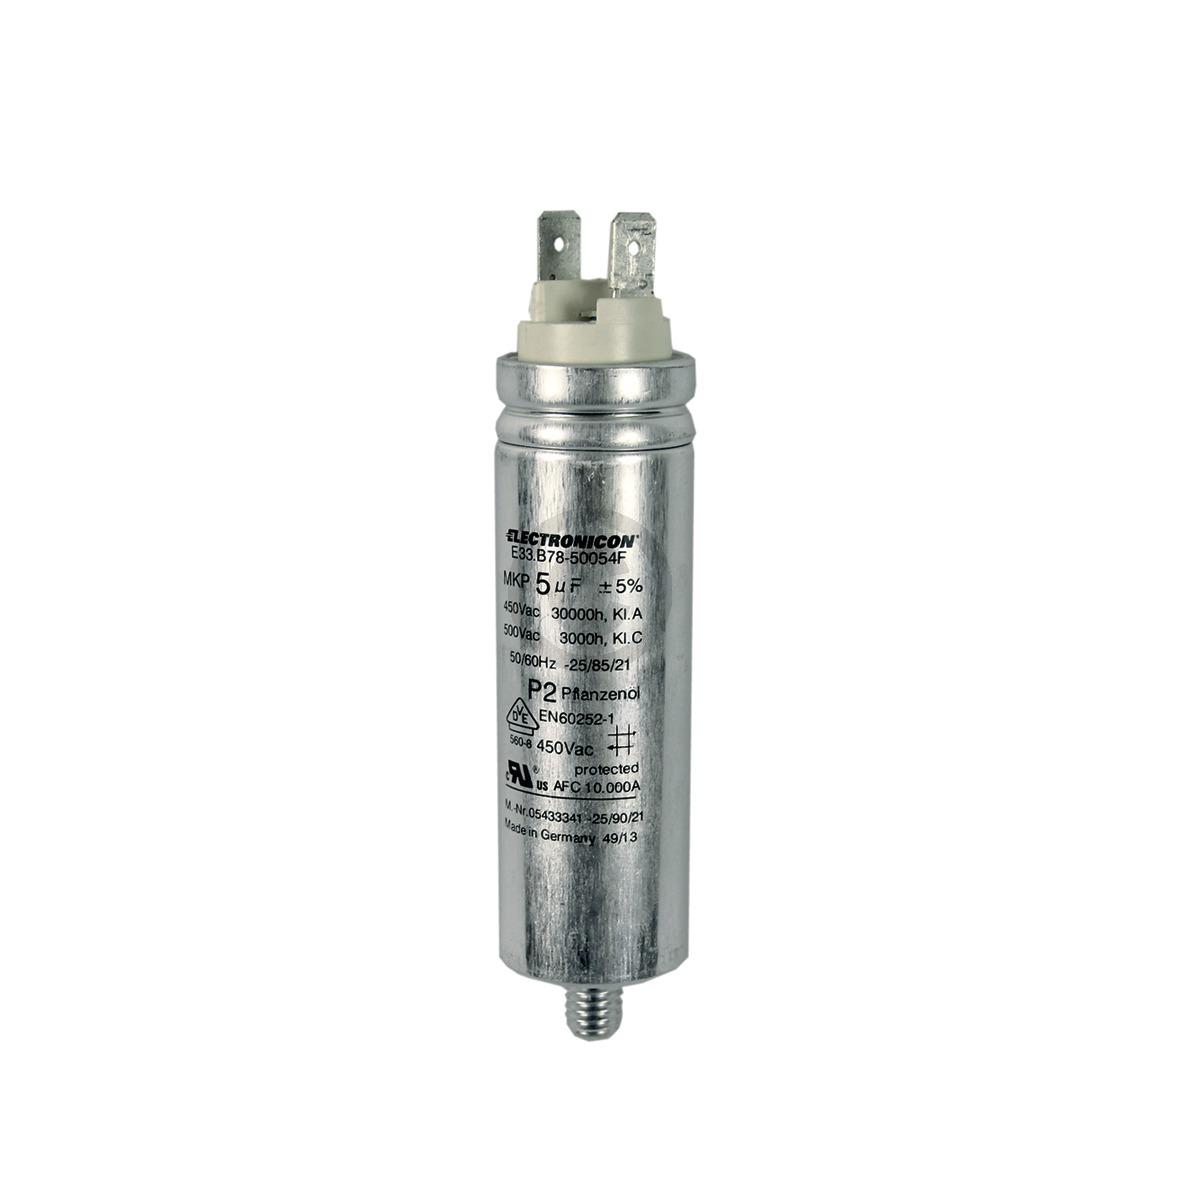 Kondensator 5,00µF 450V mit Steckfahnen 5433341 Miele